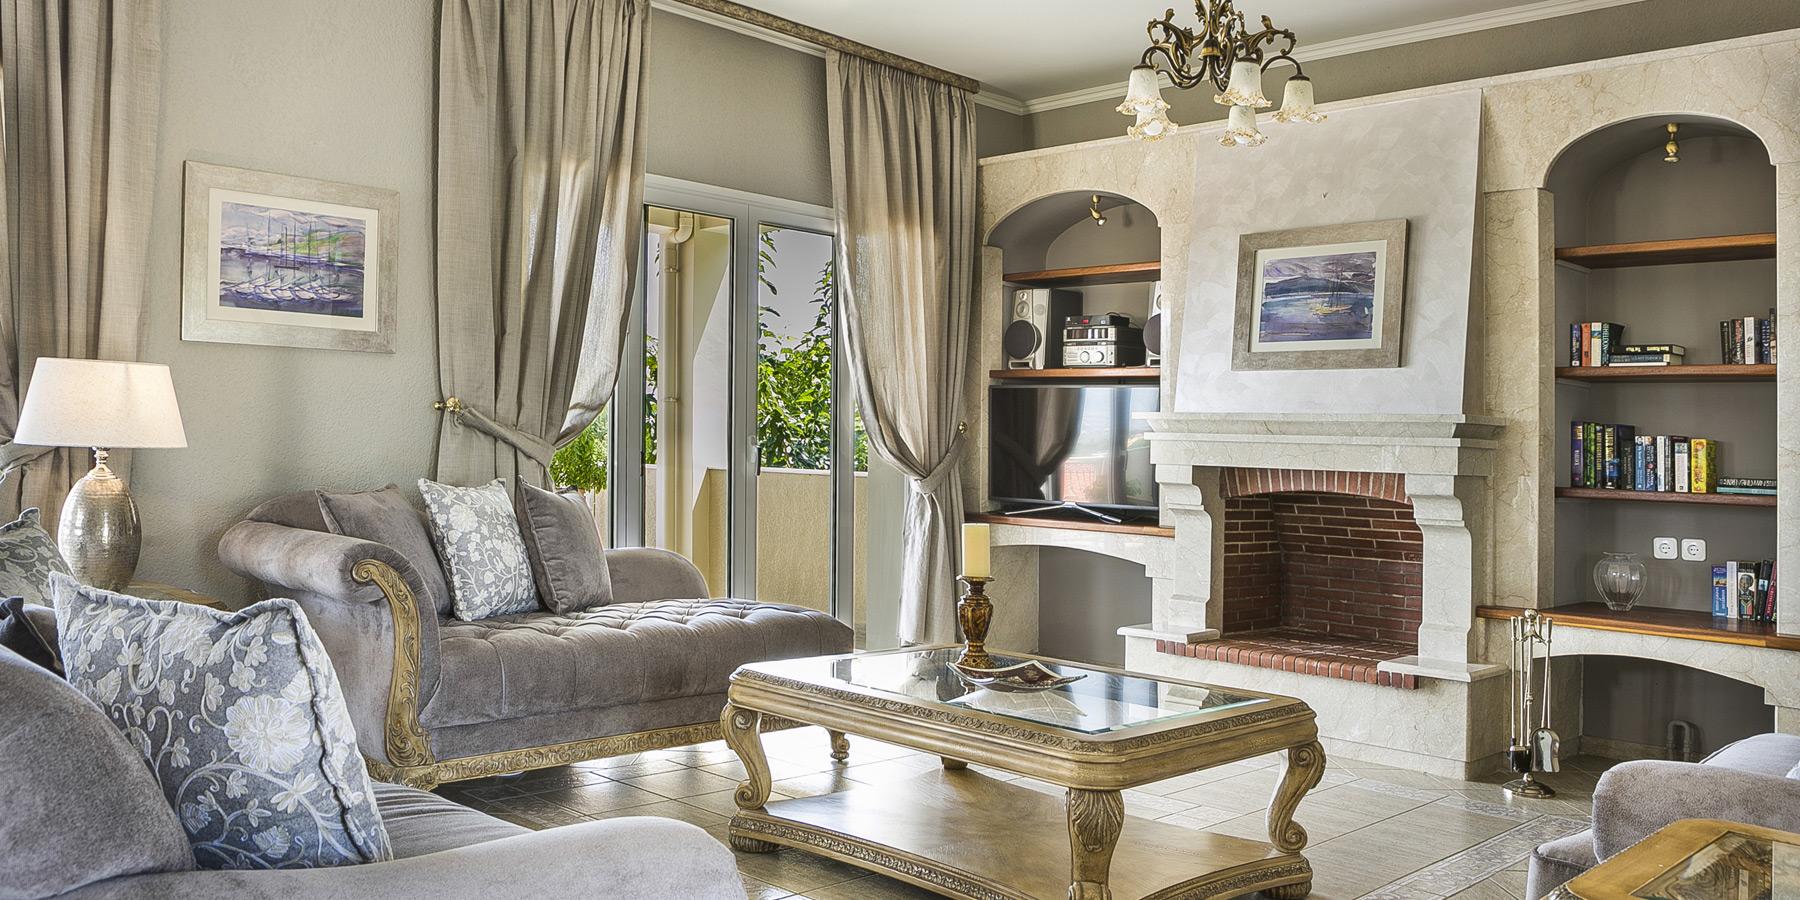 spartia_luxury_villa_kefalonia_villa_002